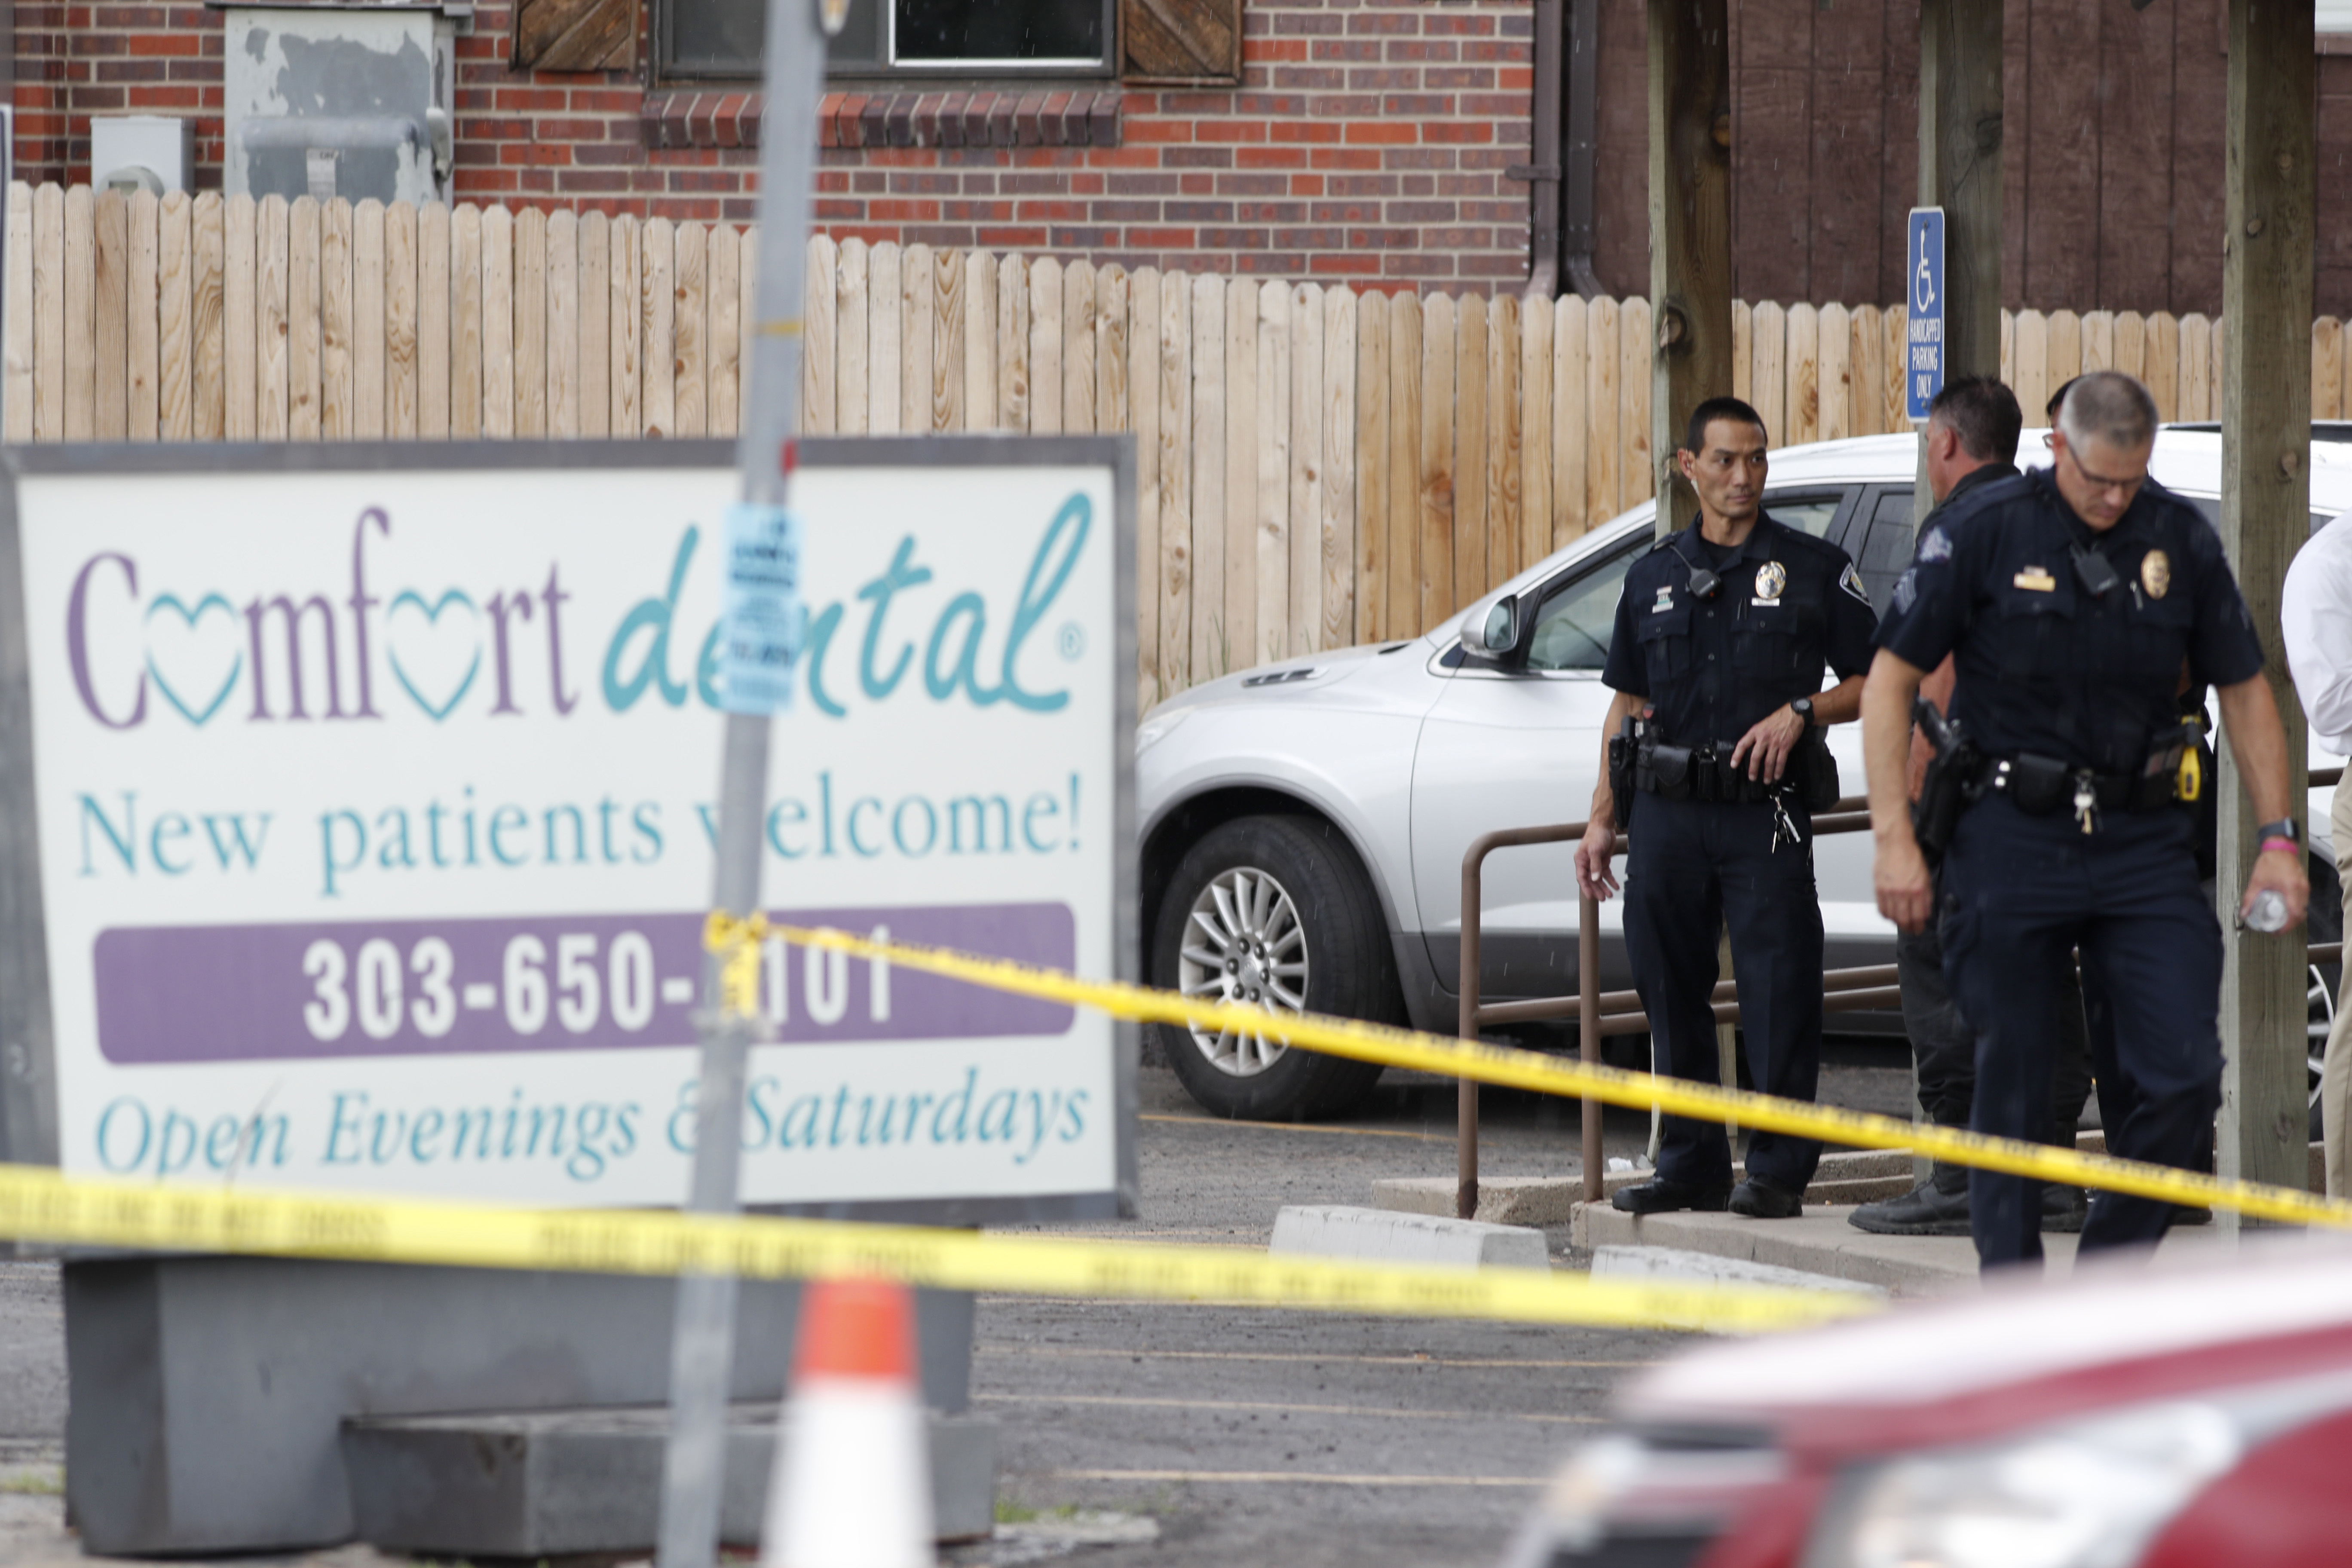 Photo: Westminster Dentist Road Rage Shooting - AP Photo